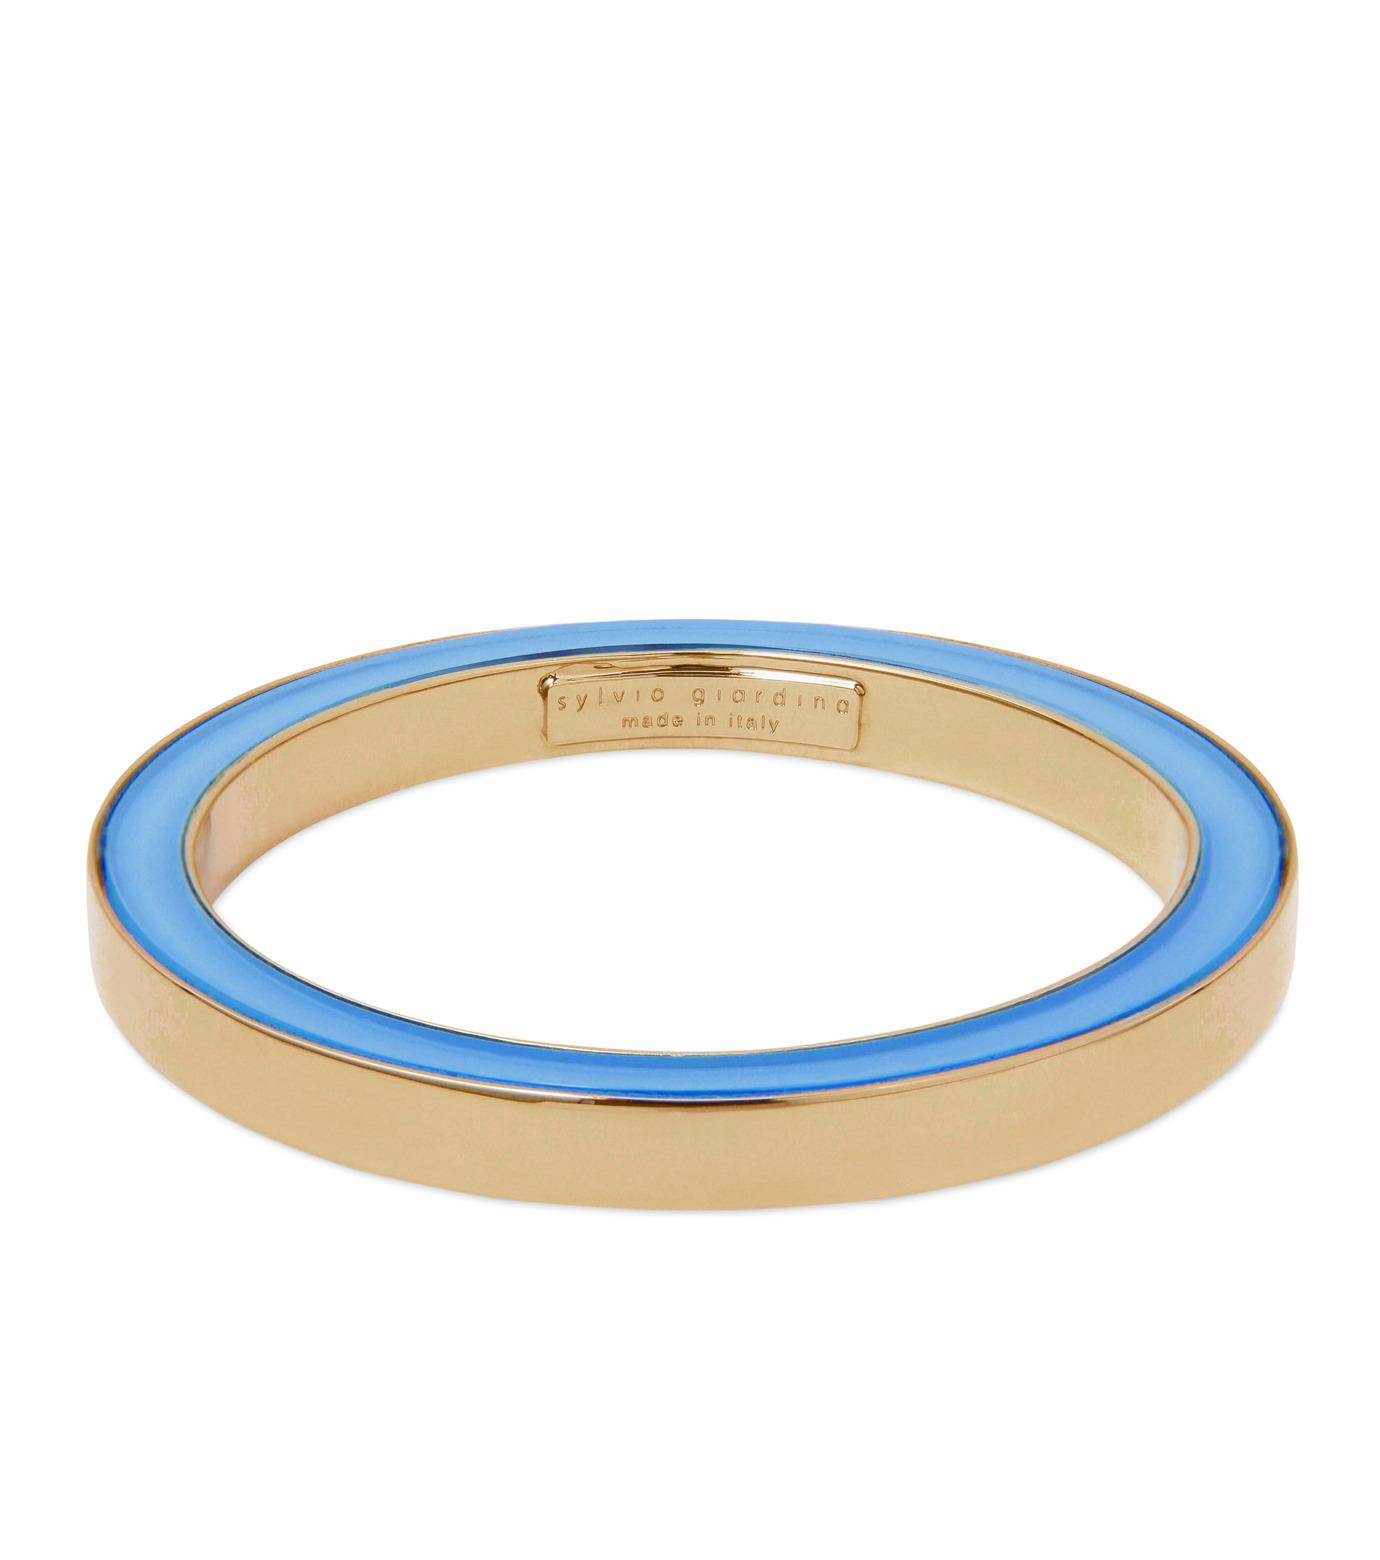 Sylvio Giardina(シルビオ・ジャルディーナ)のBracelet-LIGHT BLUE(ブレスレット/bracelet)-ART57-91 拡大詳細画像3